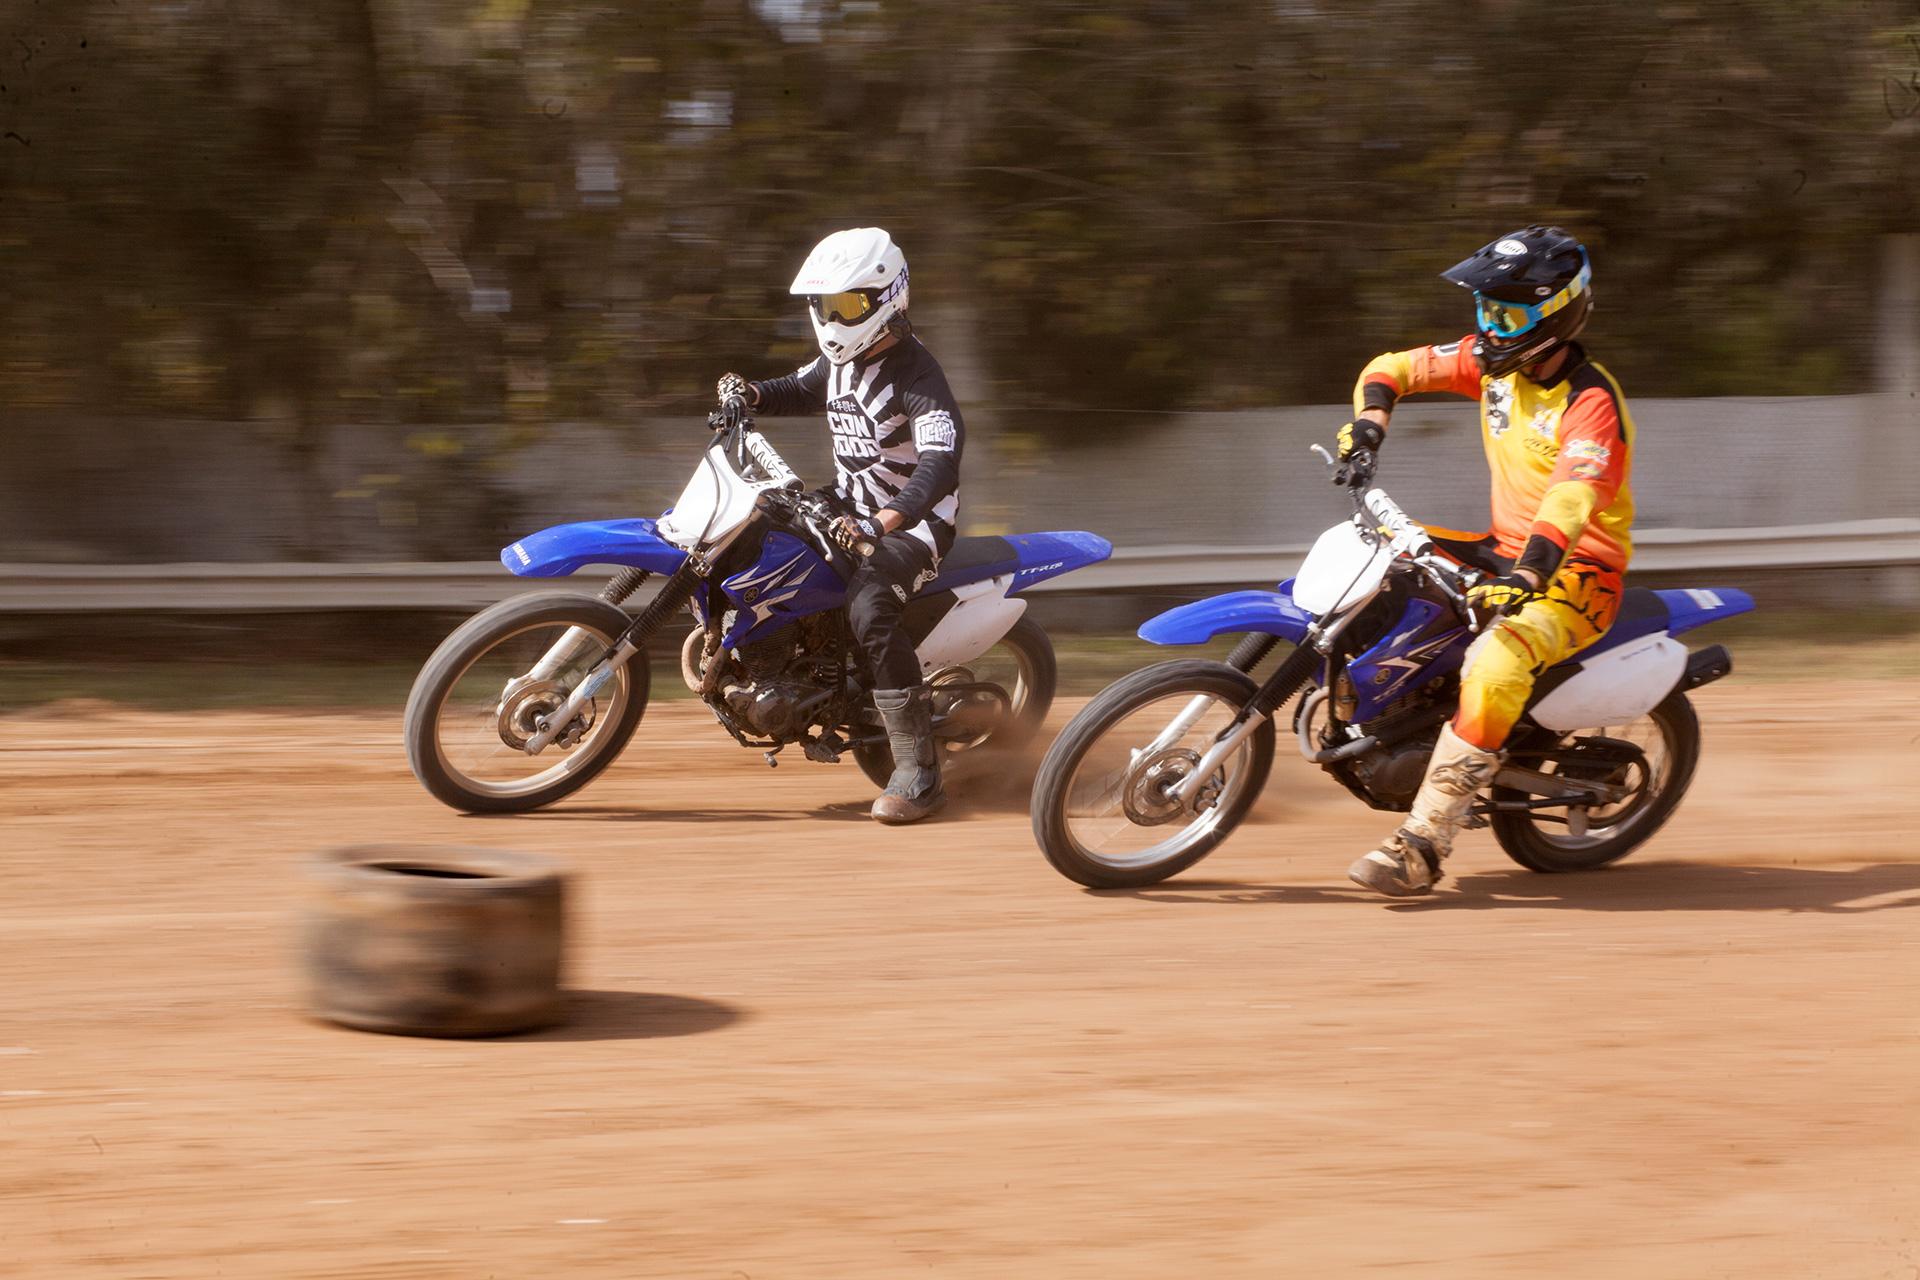 Flat Track Racer & Caretaker's Guide To Dirt Track Prep